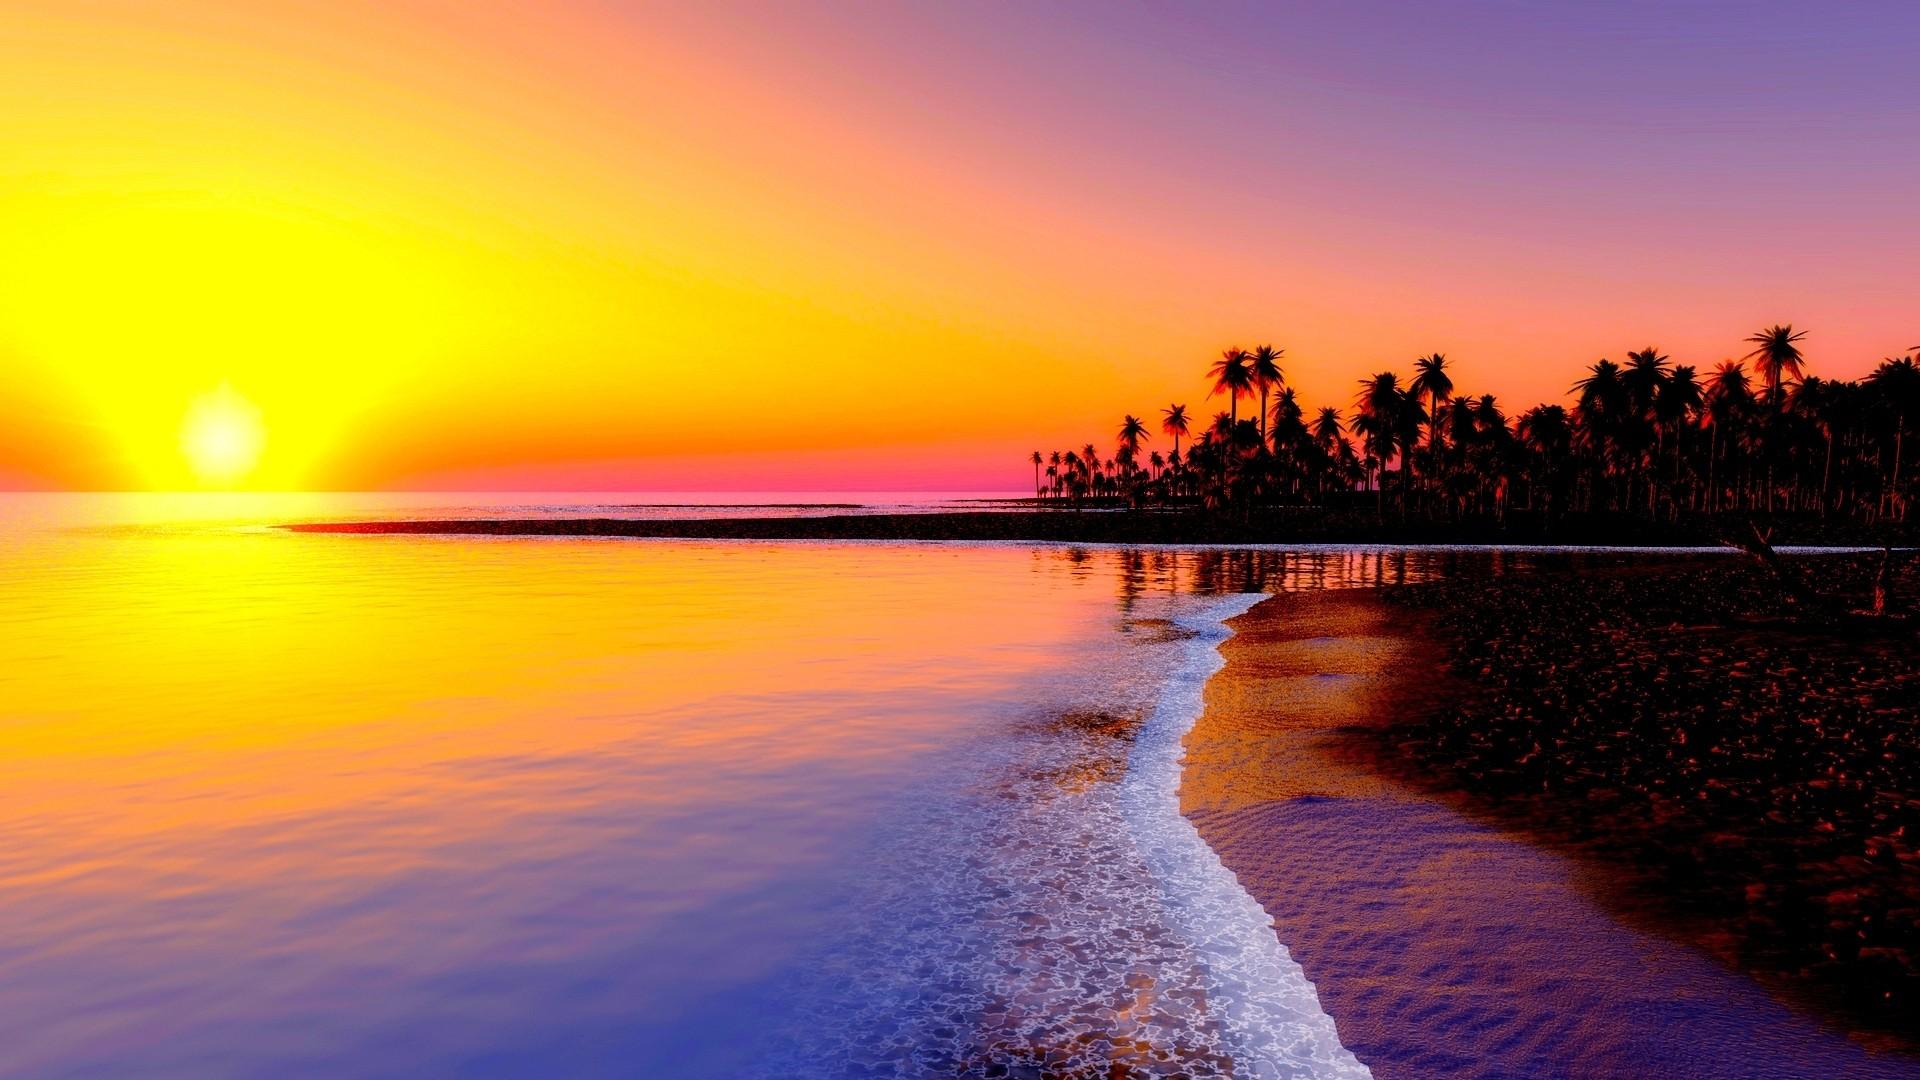 Wallpaper beach, tropics, sea, sand, palm trees, sunset